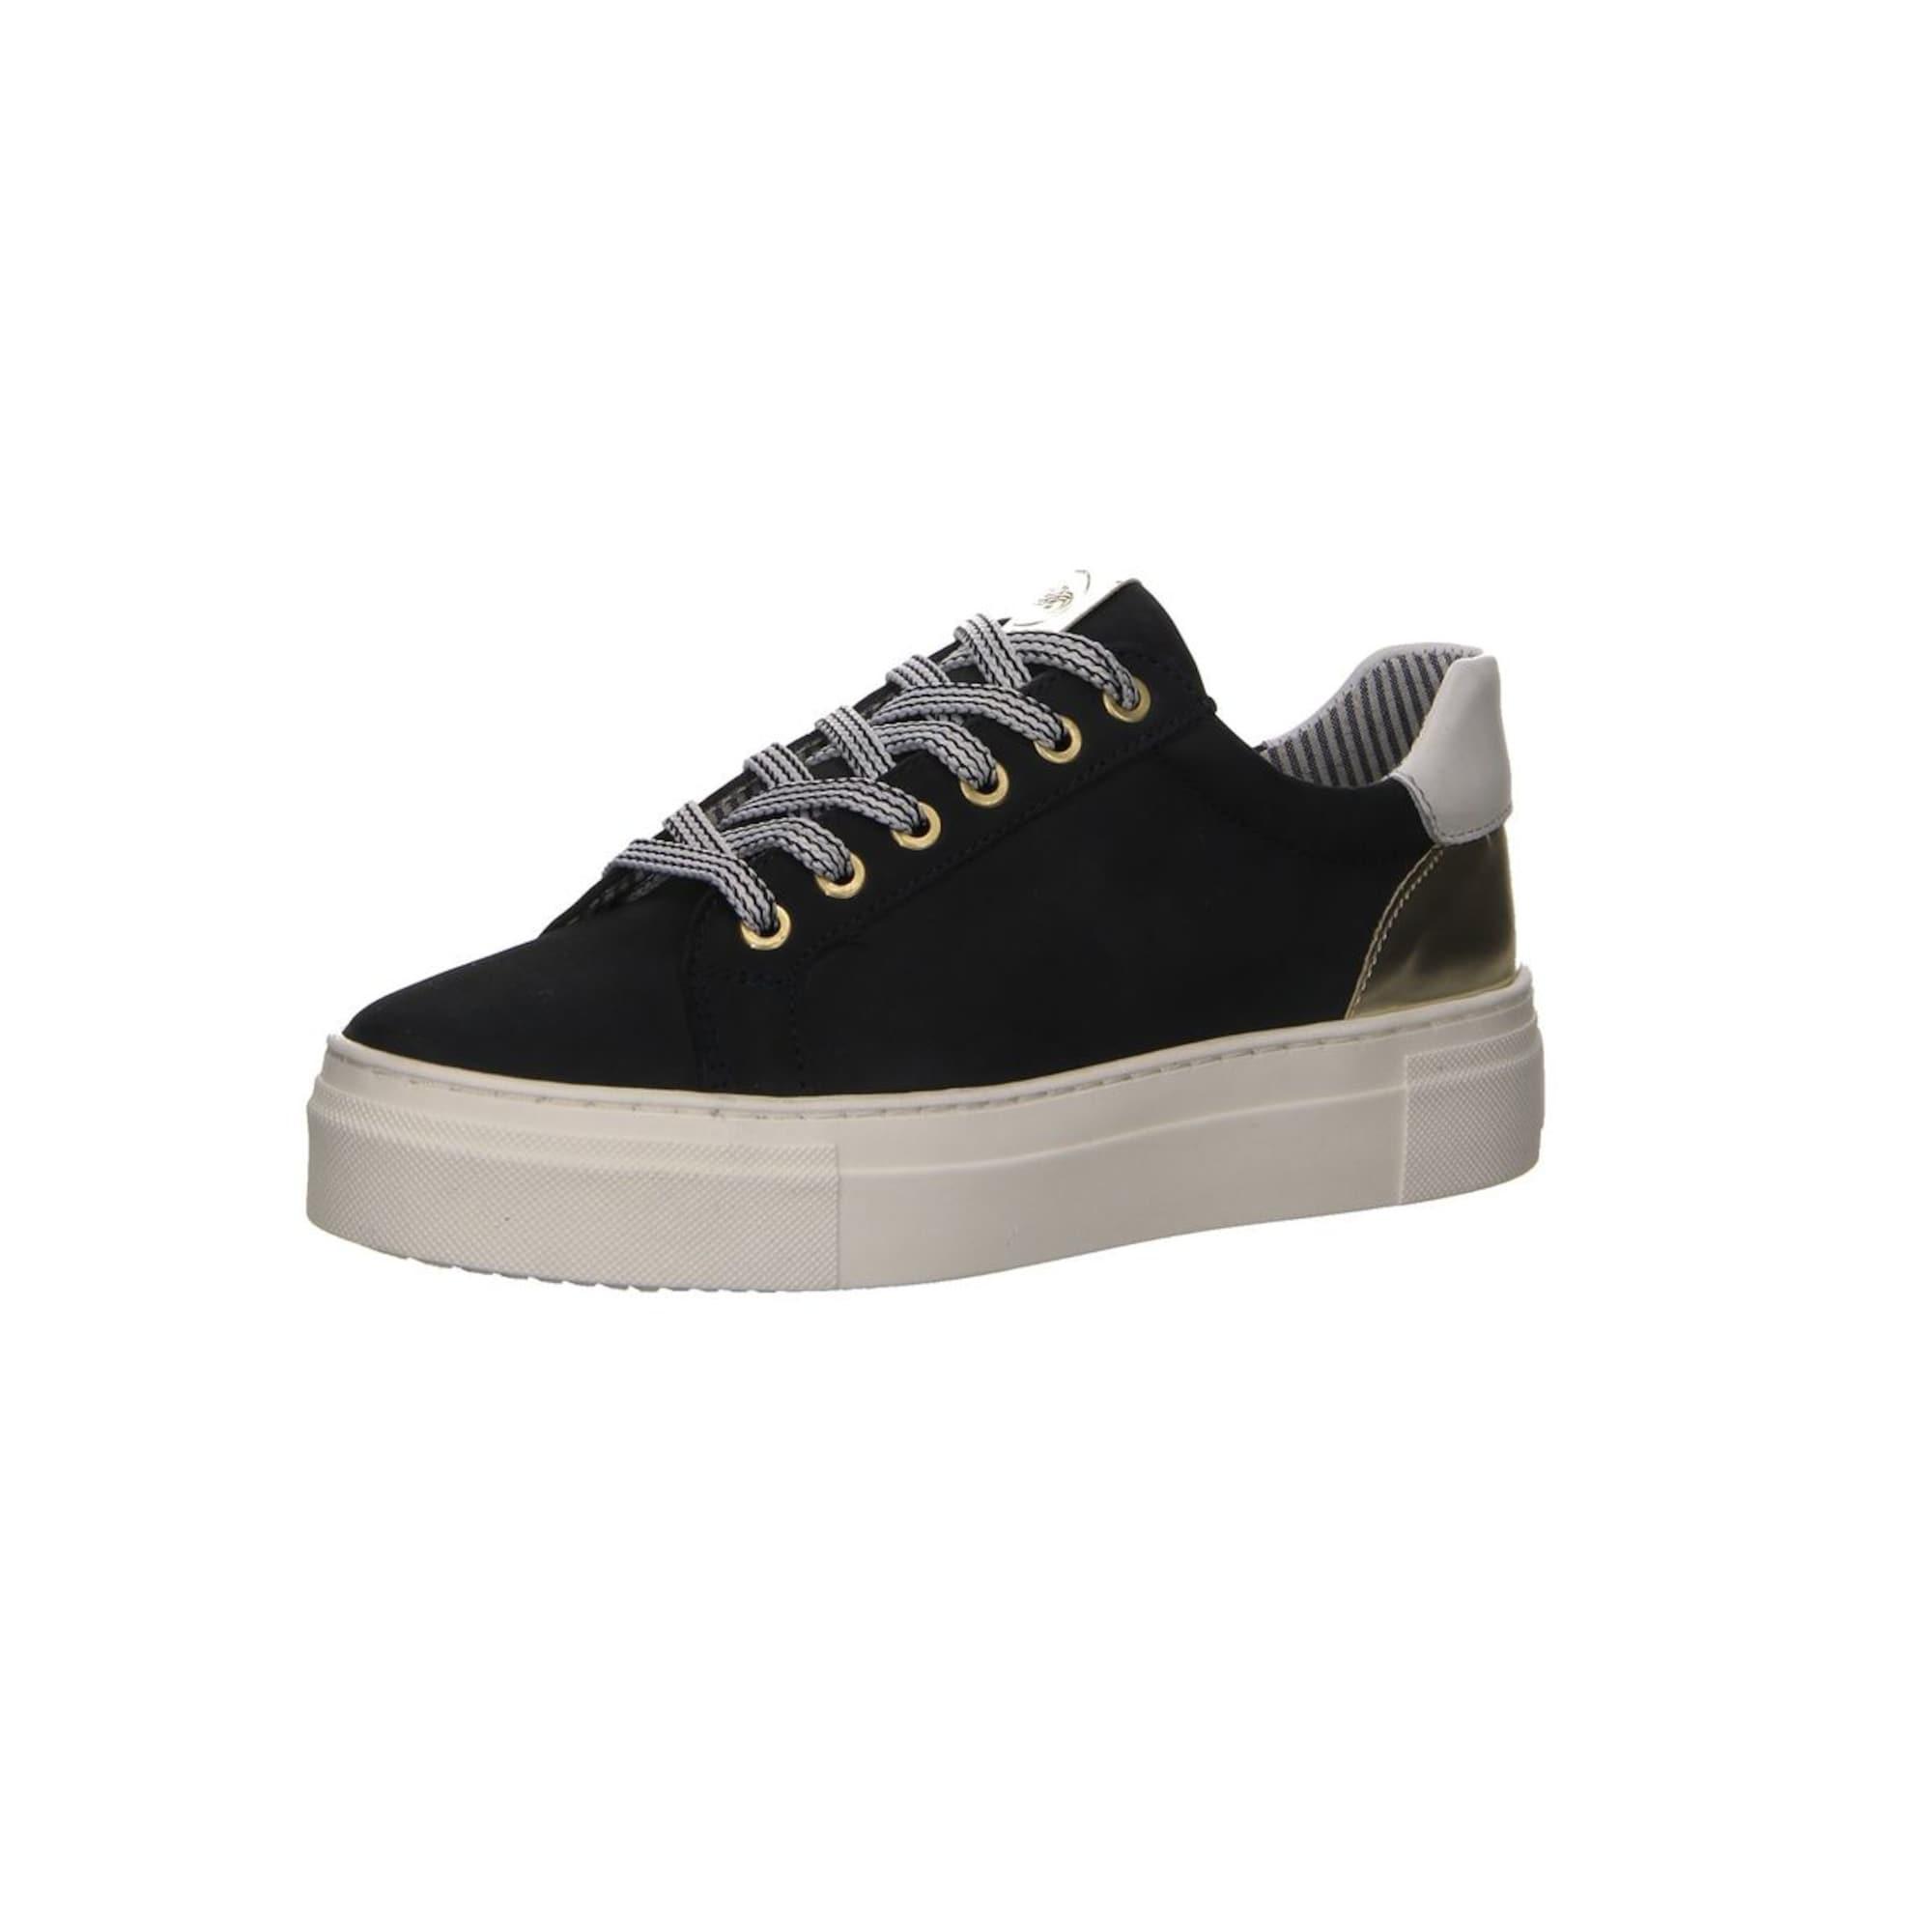 Schnürschuhe   Schuhe > Schnürschuhe   Gold - Schwarz   SALAMANDER